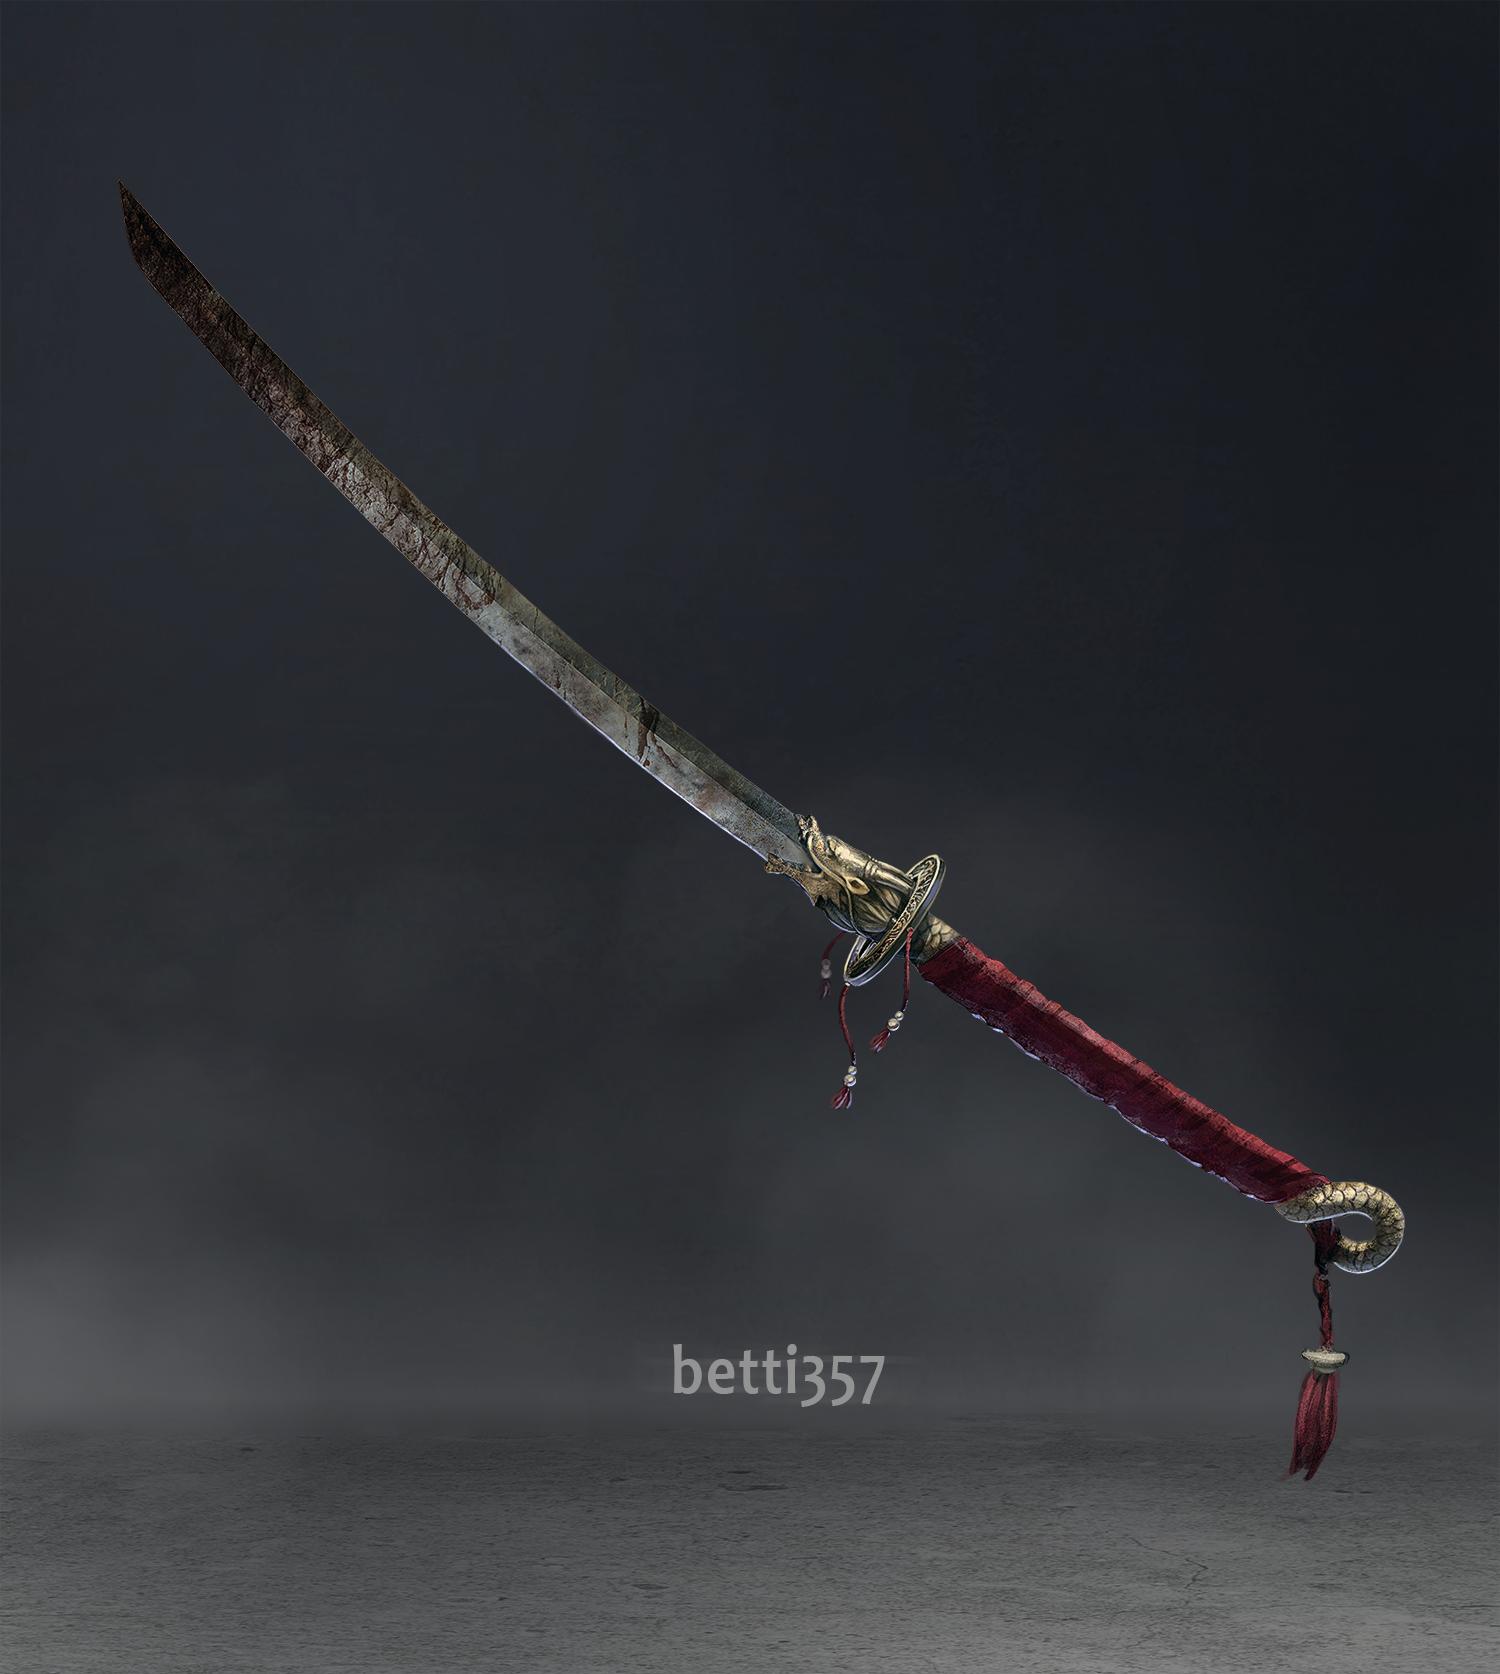 ONI_betti357_weapon.png